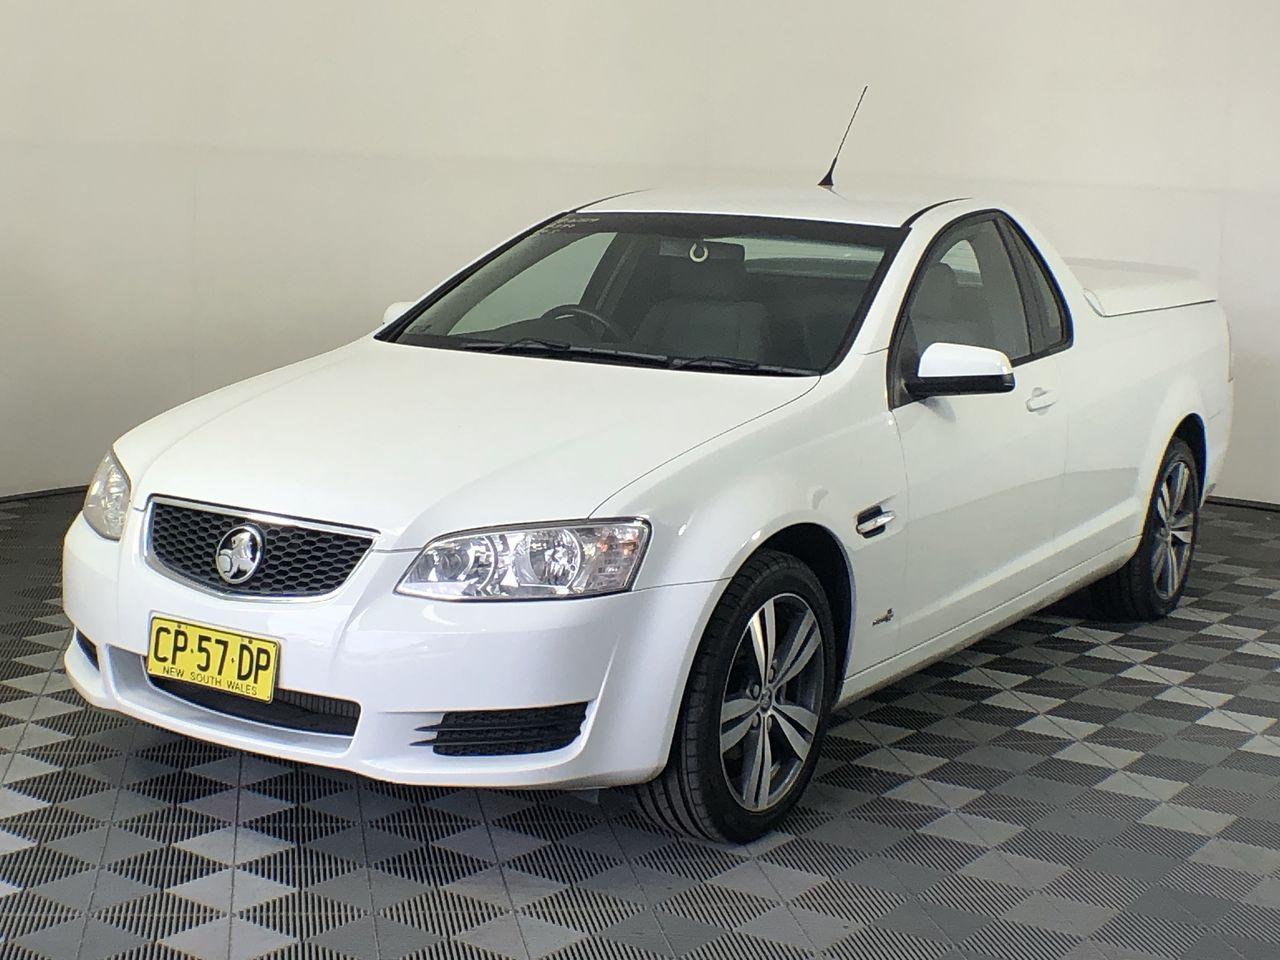 2011 Holden Commodore Omega VE II Automatic Ute